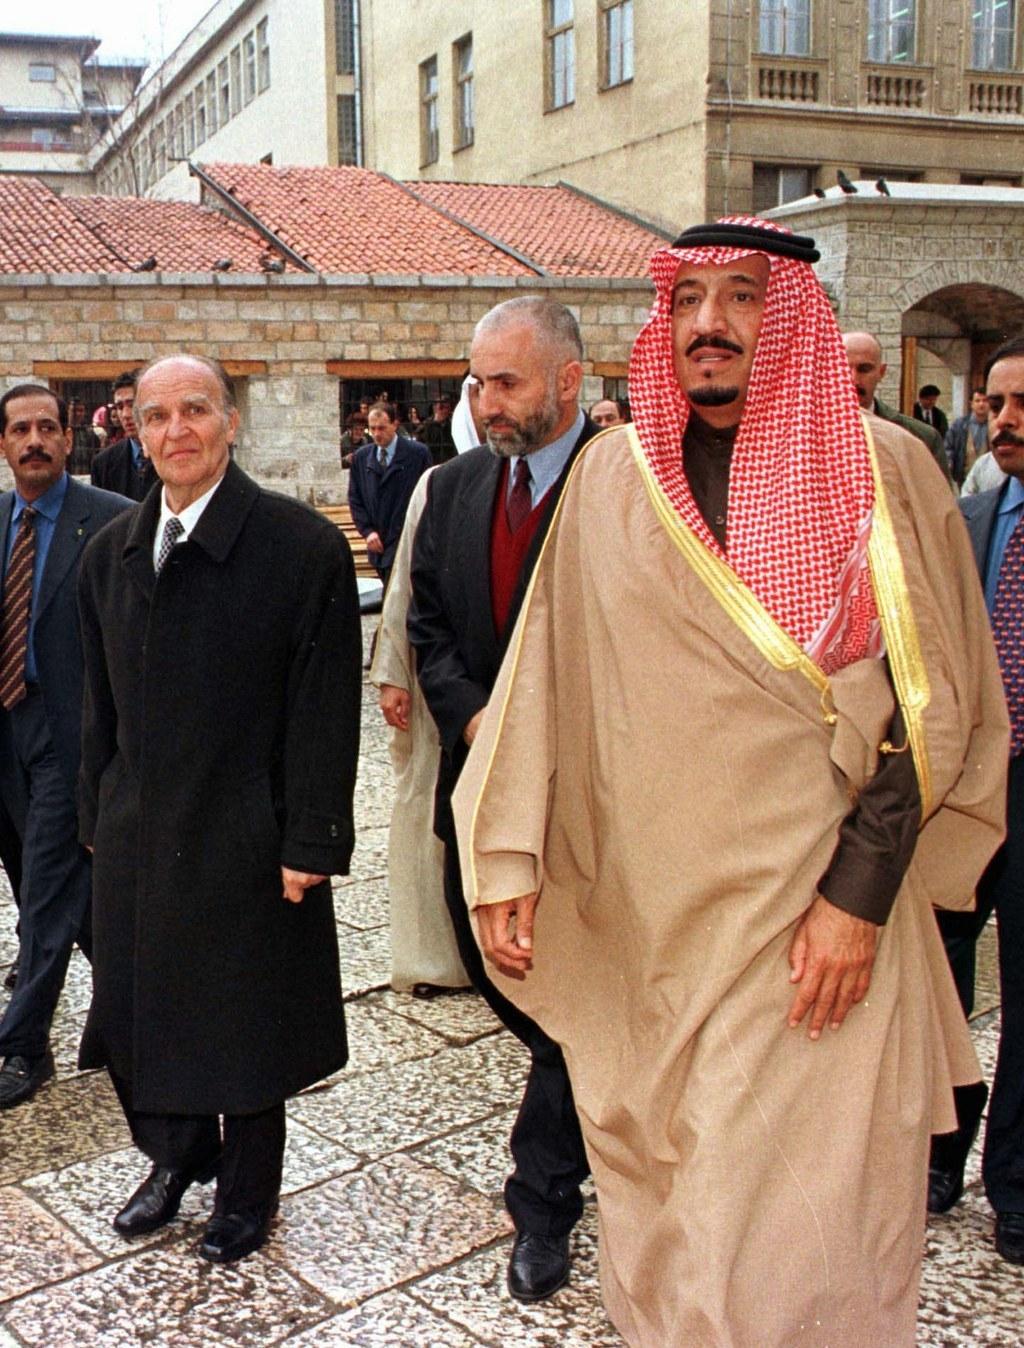 Meet The New King Of Saudi Arabia